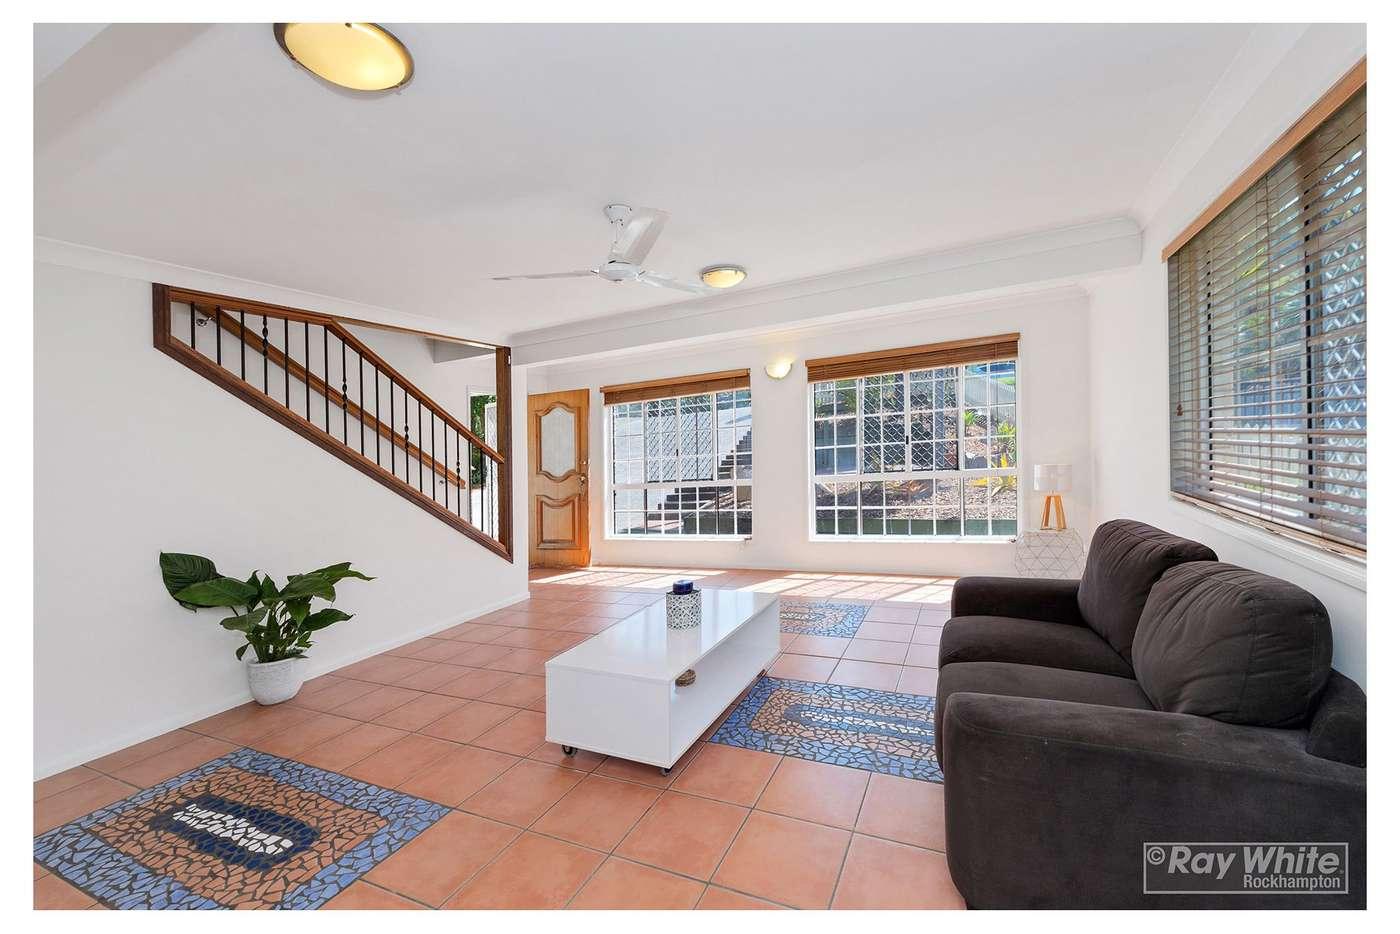 Sixth view of Homely house listing, 16 Hutcheon Street, Kawana QLD 4701